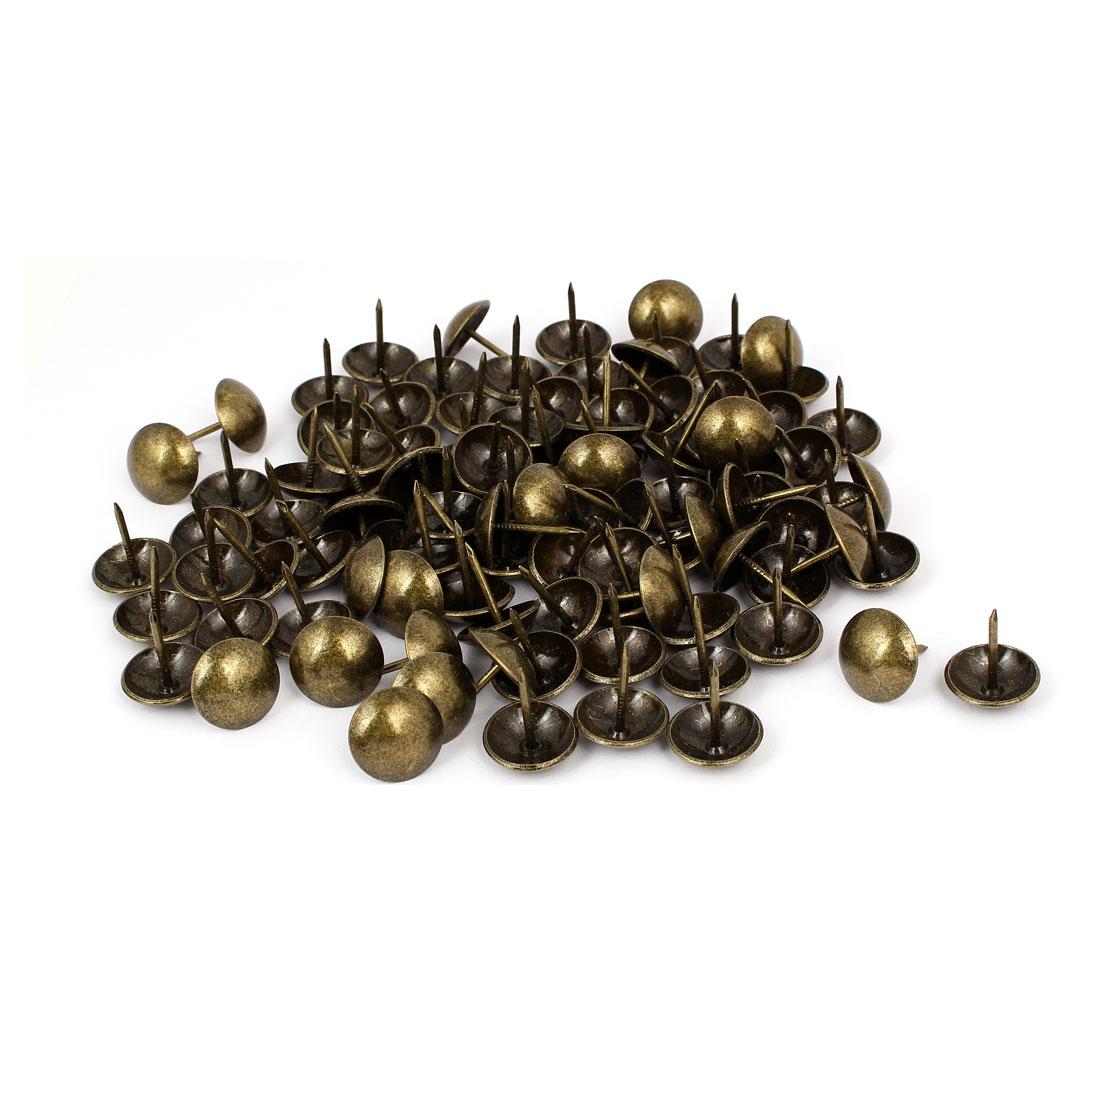 Household Metal Domed Head Upholstery Tack Nail Bronze Tone 19mm Dia 100pcs